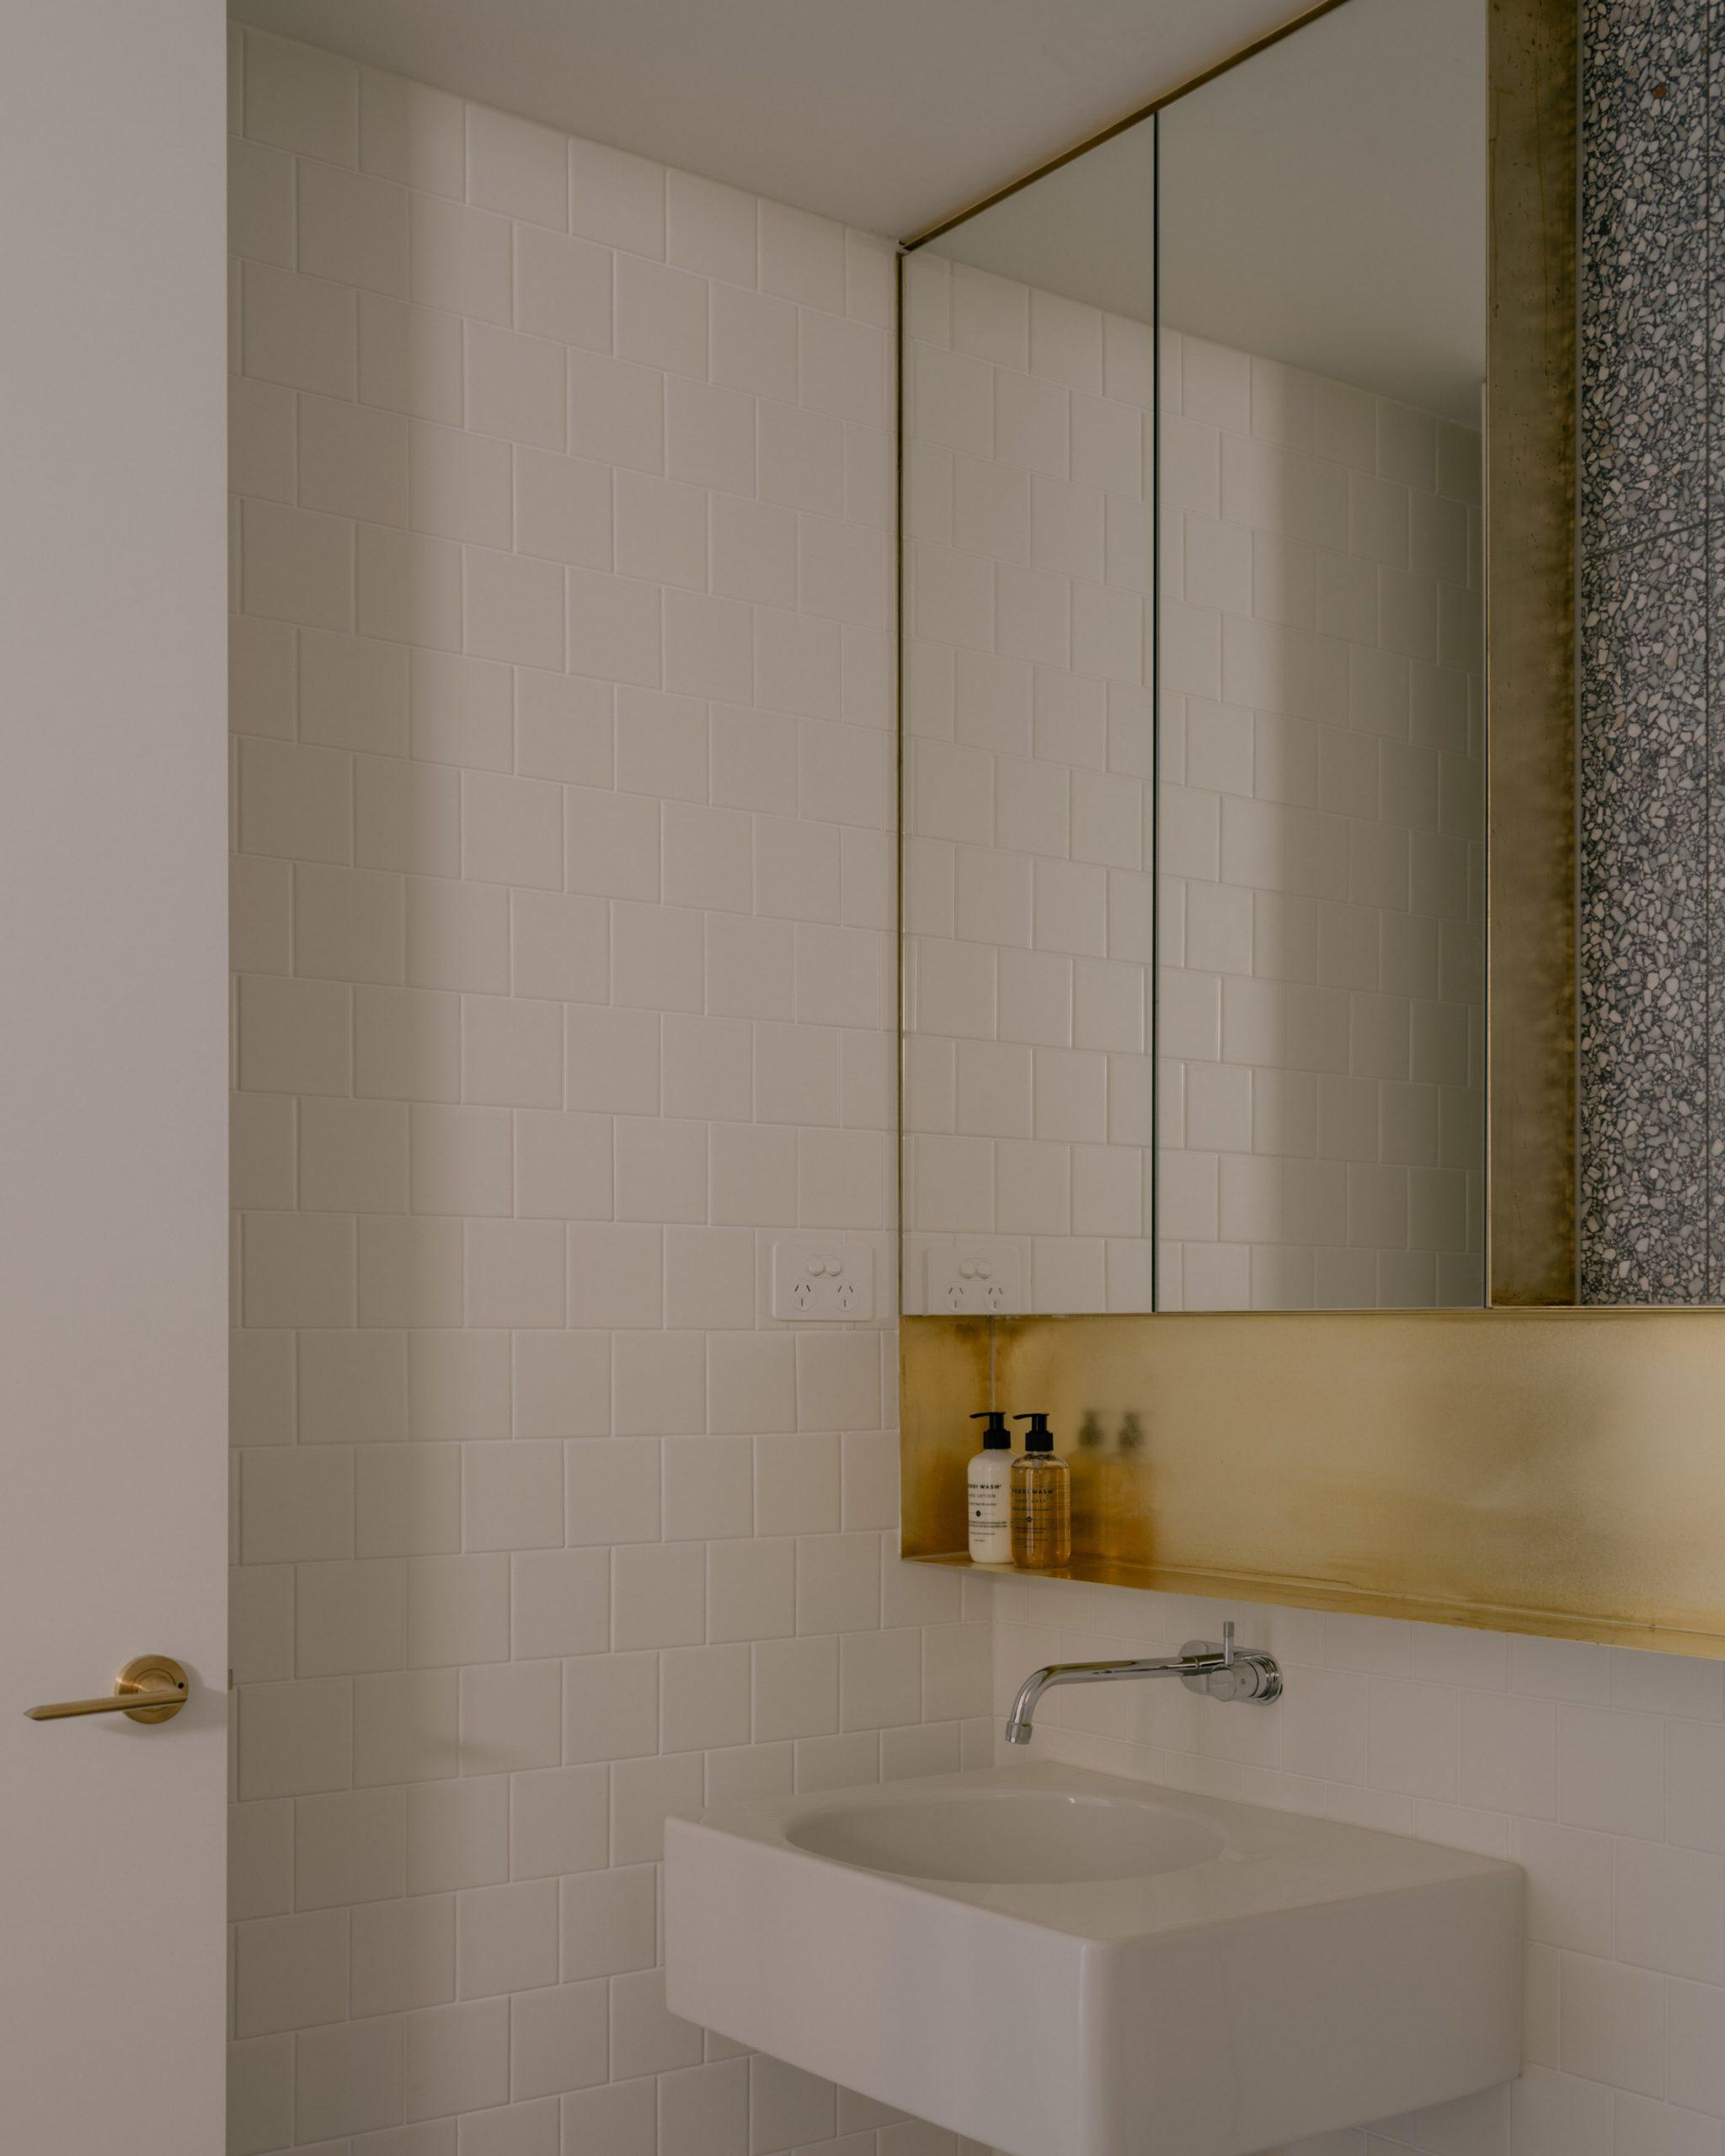 Bathrooms of Napier Street apartments by Freadman White